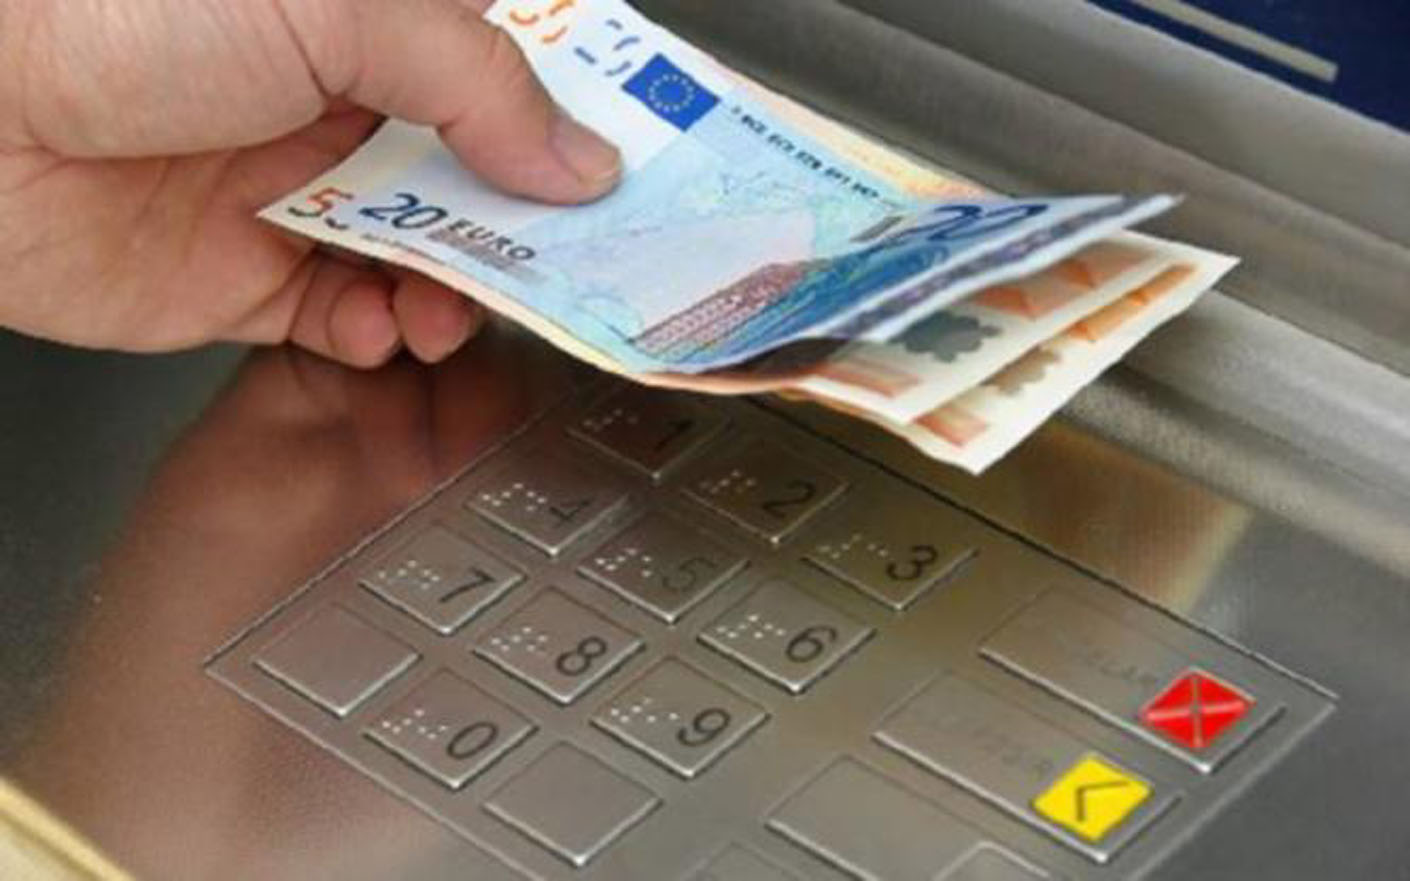 Capital Controls: Νέες αλλαγές - Εμβάσματα εξωτερικού